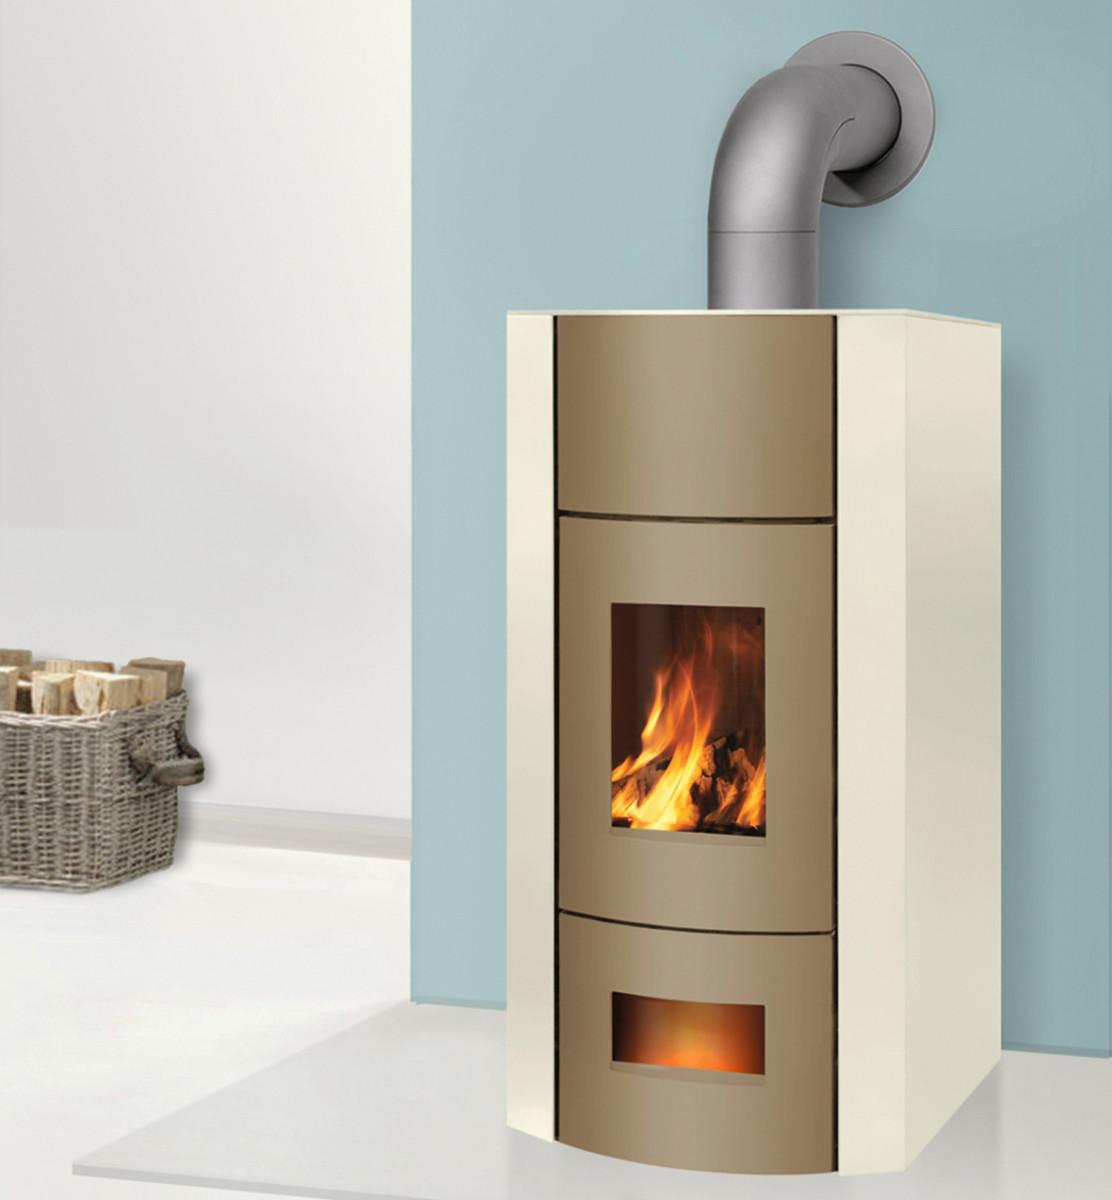 Optimale Wärme dank Holzvergaserkessel - Das eigene Haus